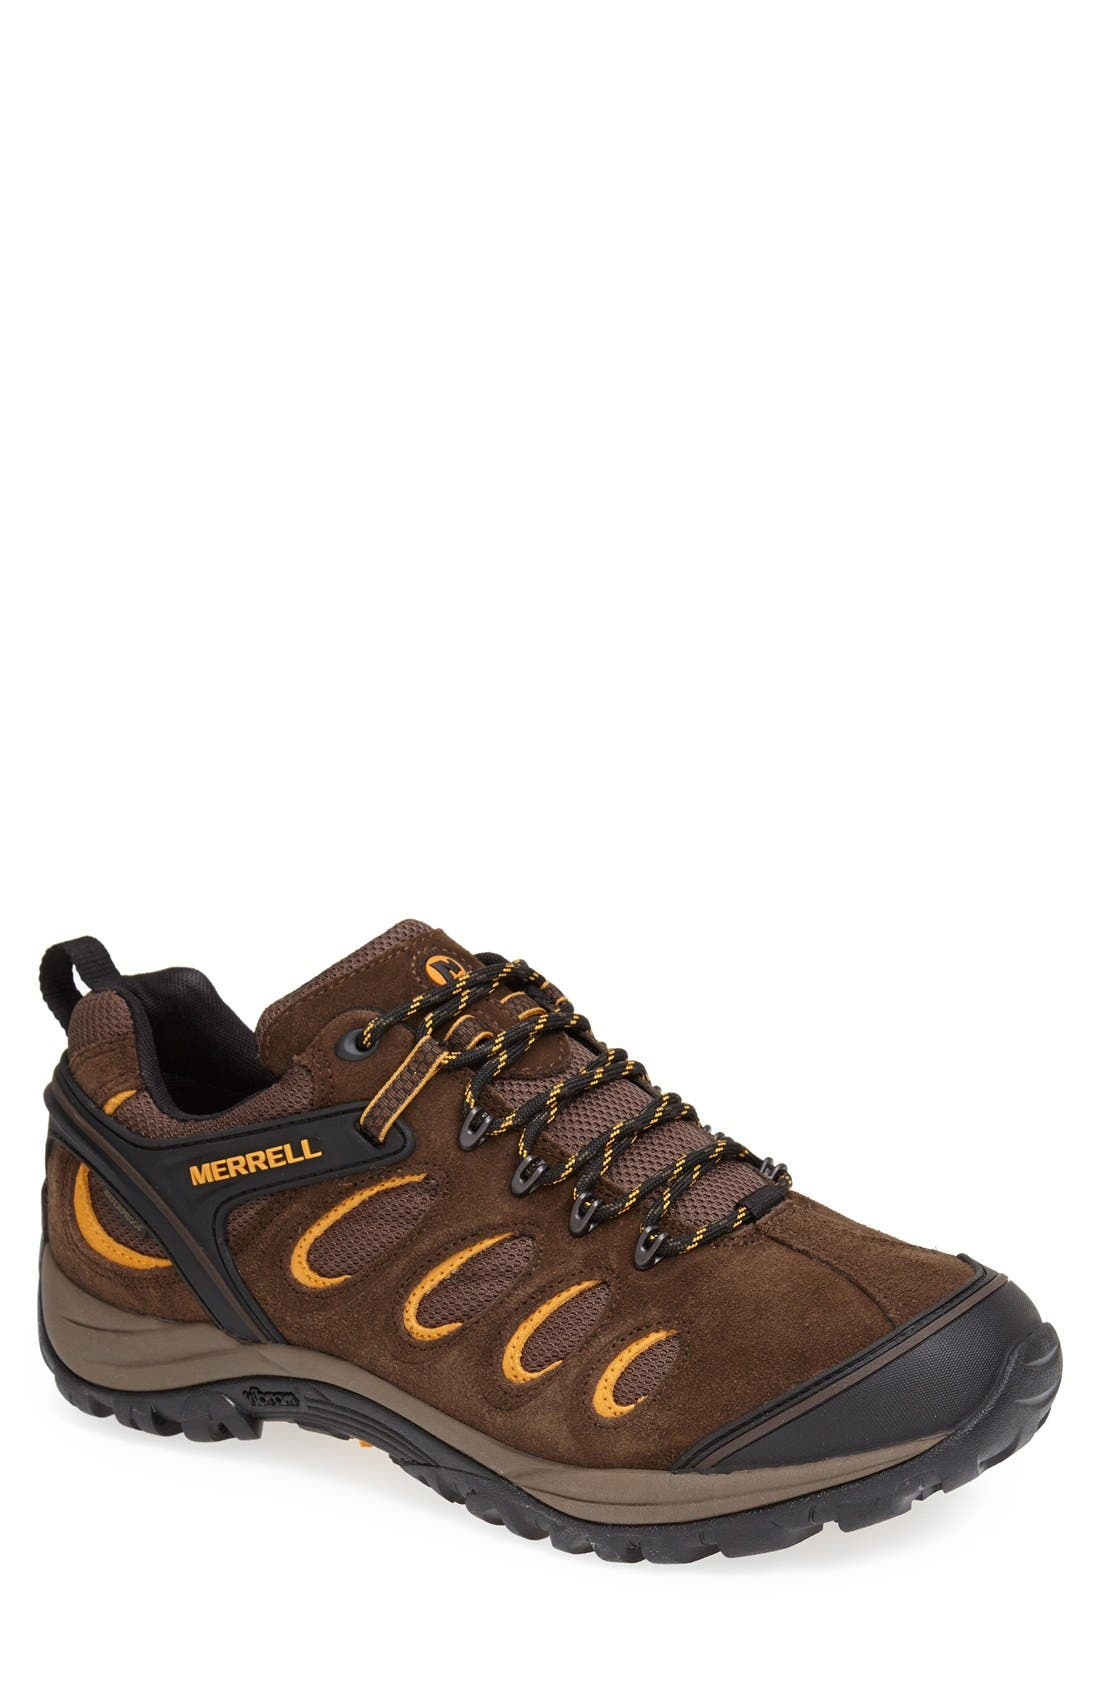 'Chameleon 5' Waterproof Hiking Shoe, Main, color, 200